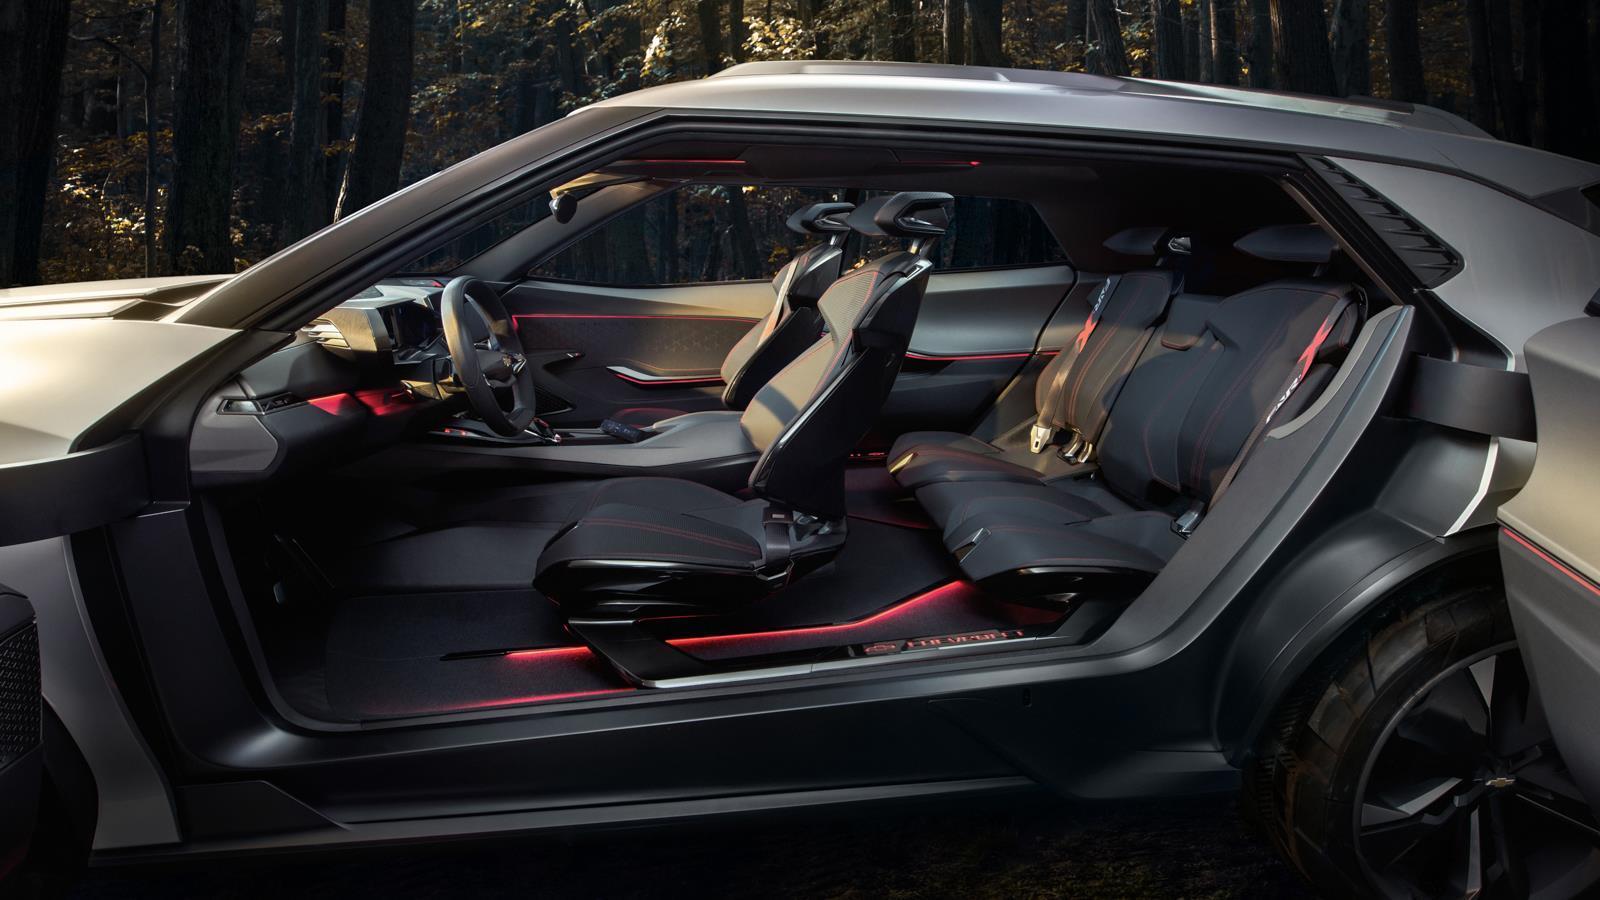 Chevrolet FNR-X Concept: Review >> Chevrolet Fnr X Concept Review Upcoming Car Release 2020